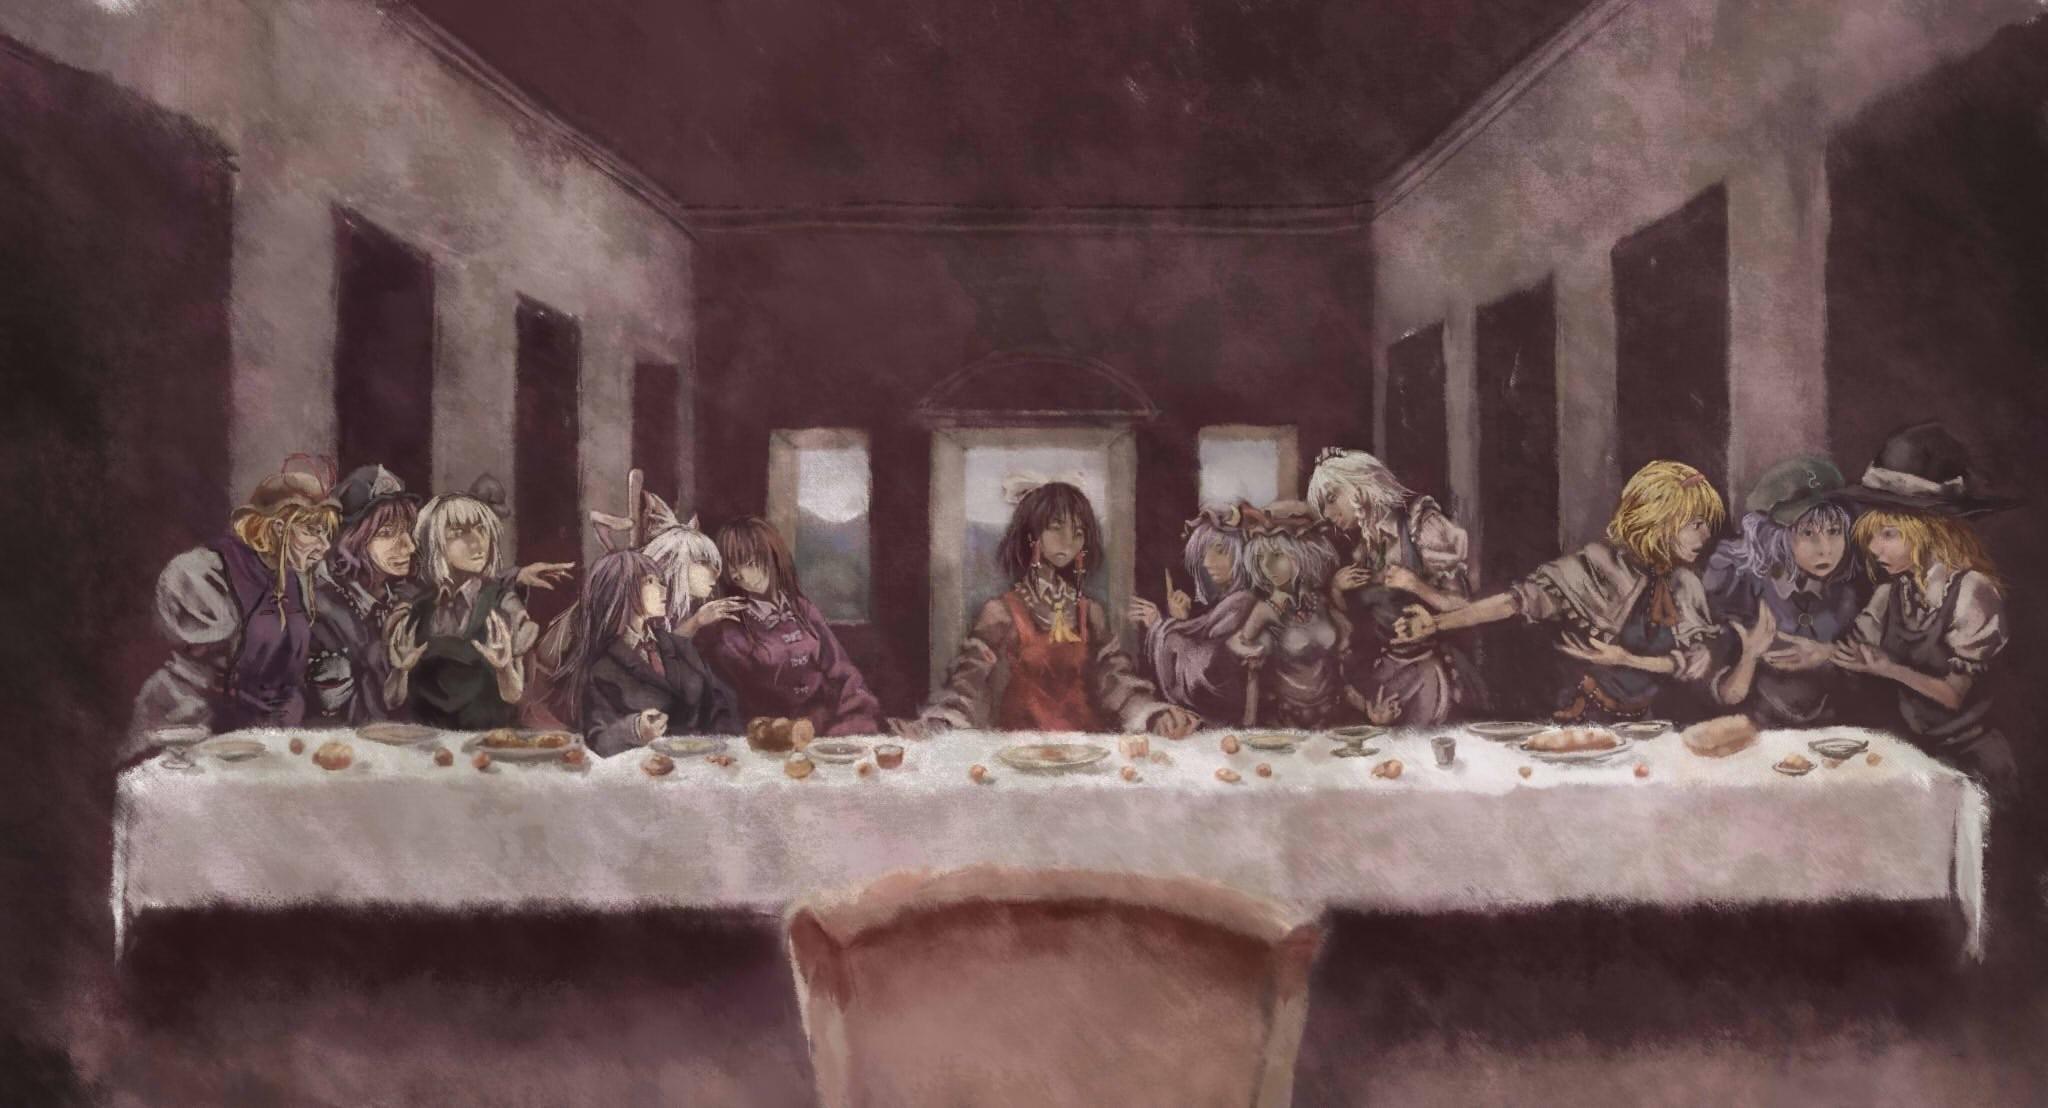 Touhou Last Supper; jesus christ